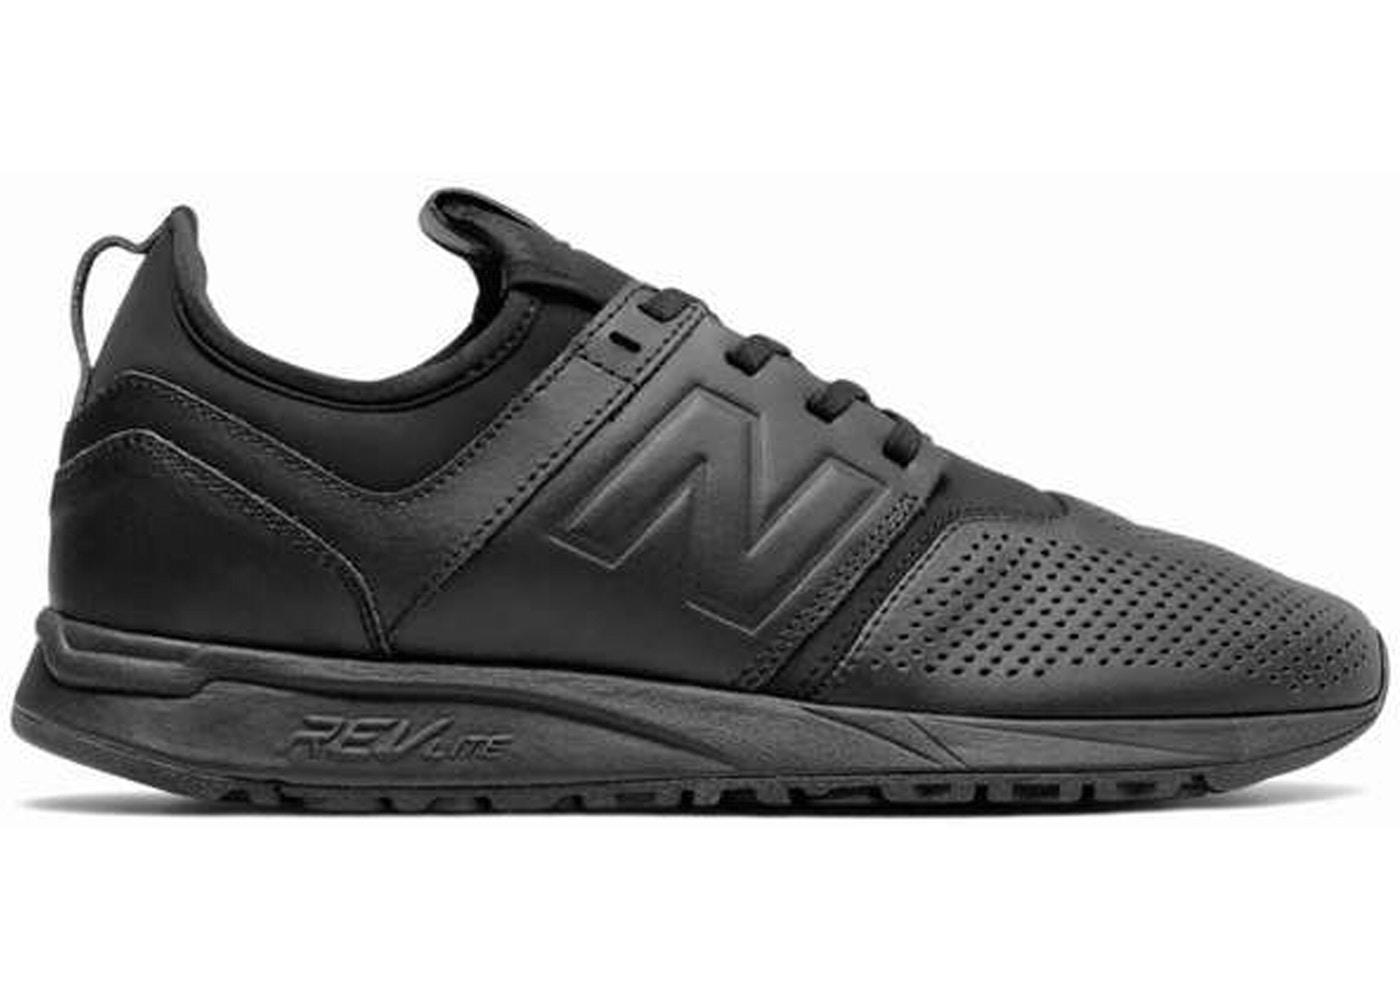 New Balance 247 Black Leather - MRL247LK